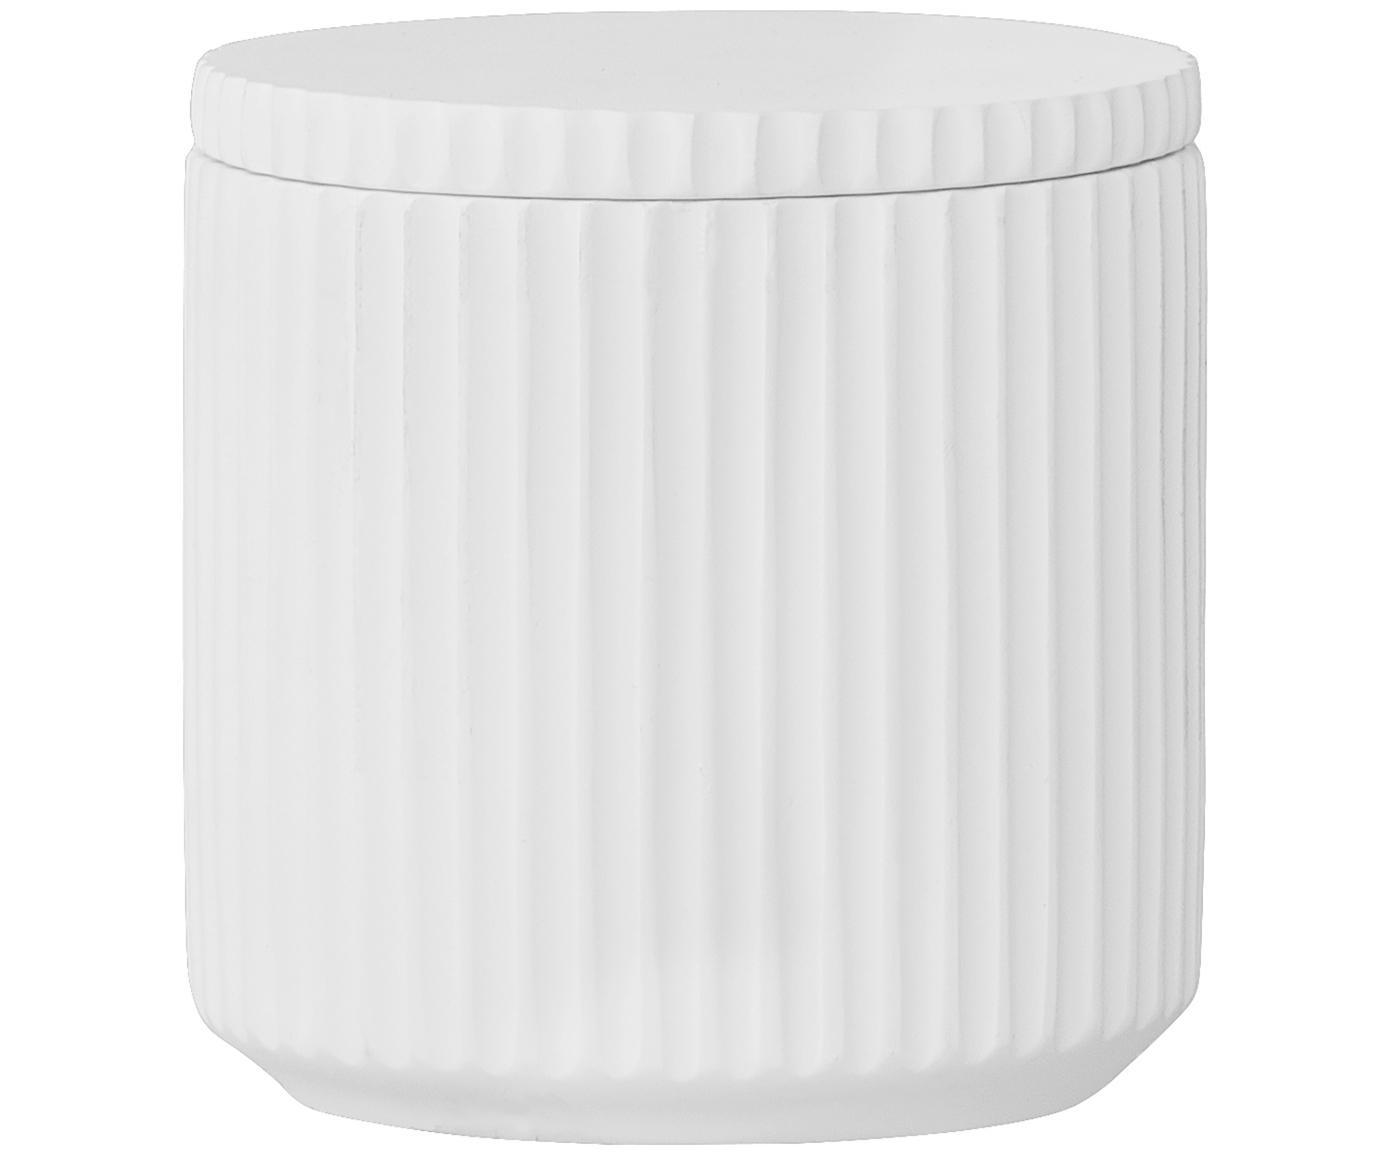 Contenitore in porcellana Alessia, Porcellana, Bianco, Ø 9 x Alt. 9 cm